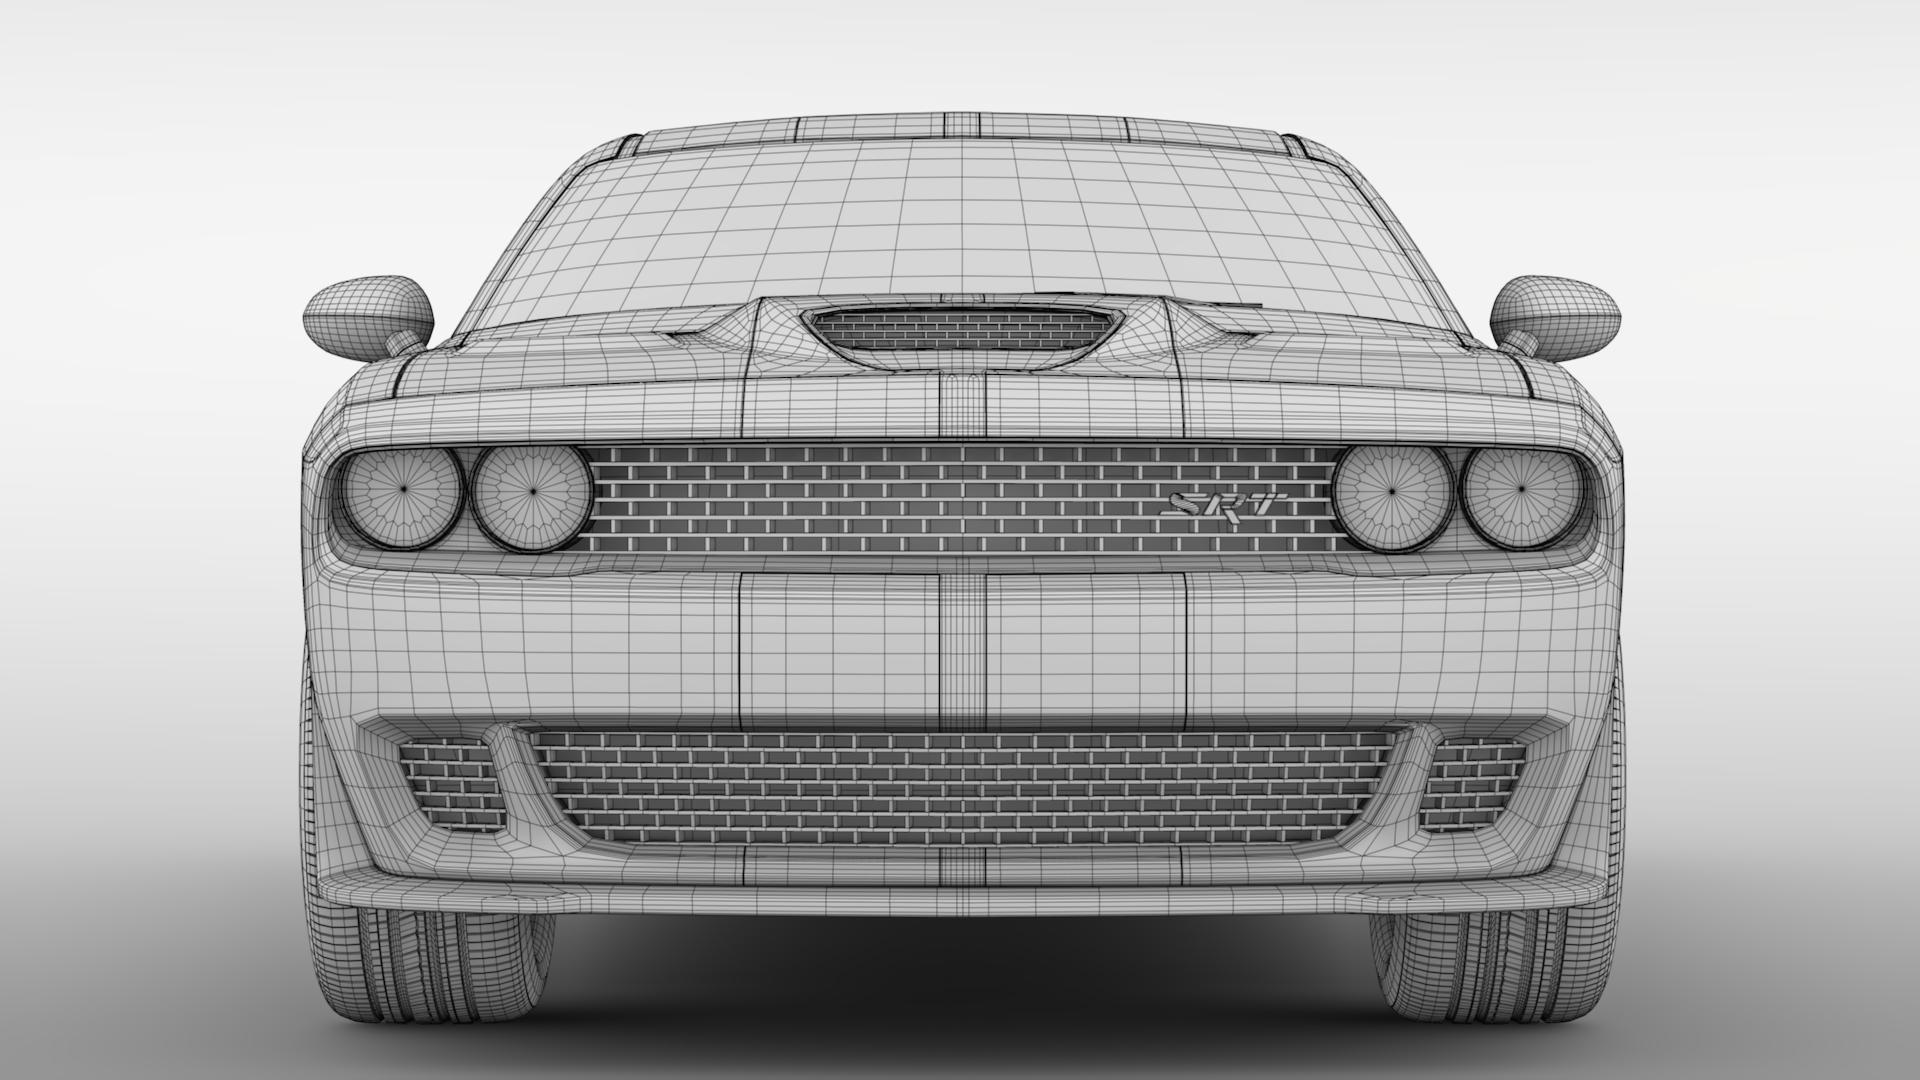 Dodge Challenger Srt Hellcat Go Mangoo 2017 By Creator 3d 3docean